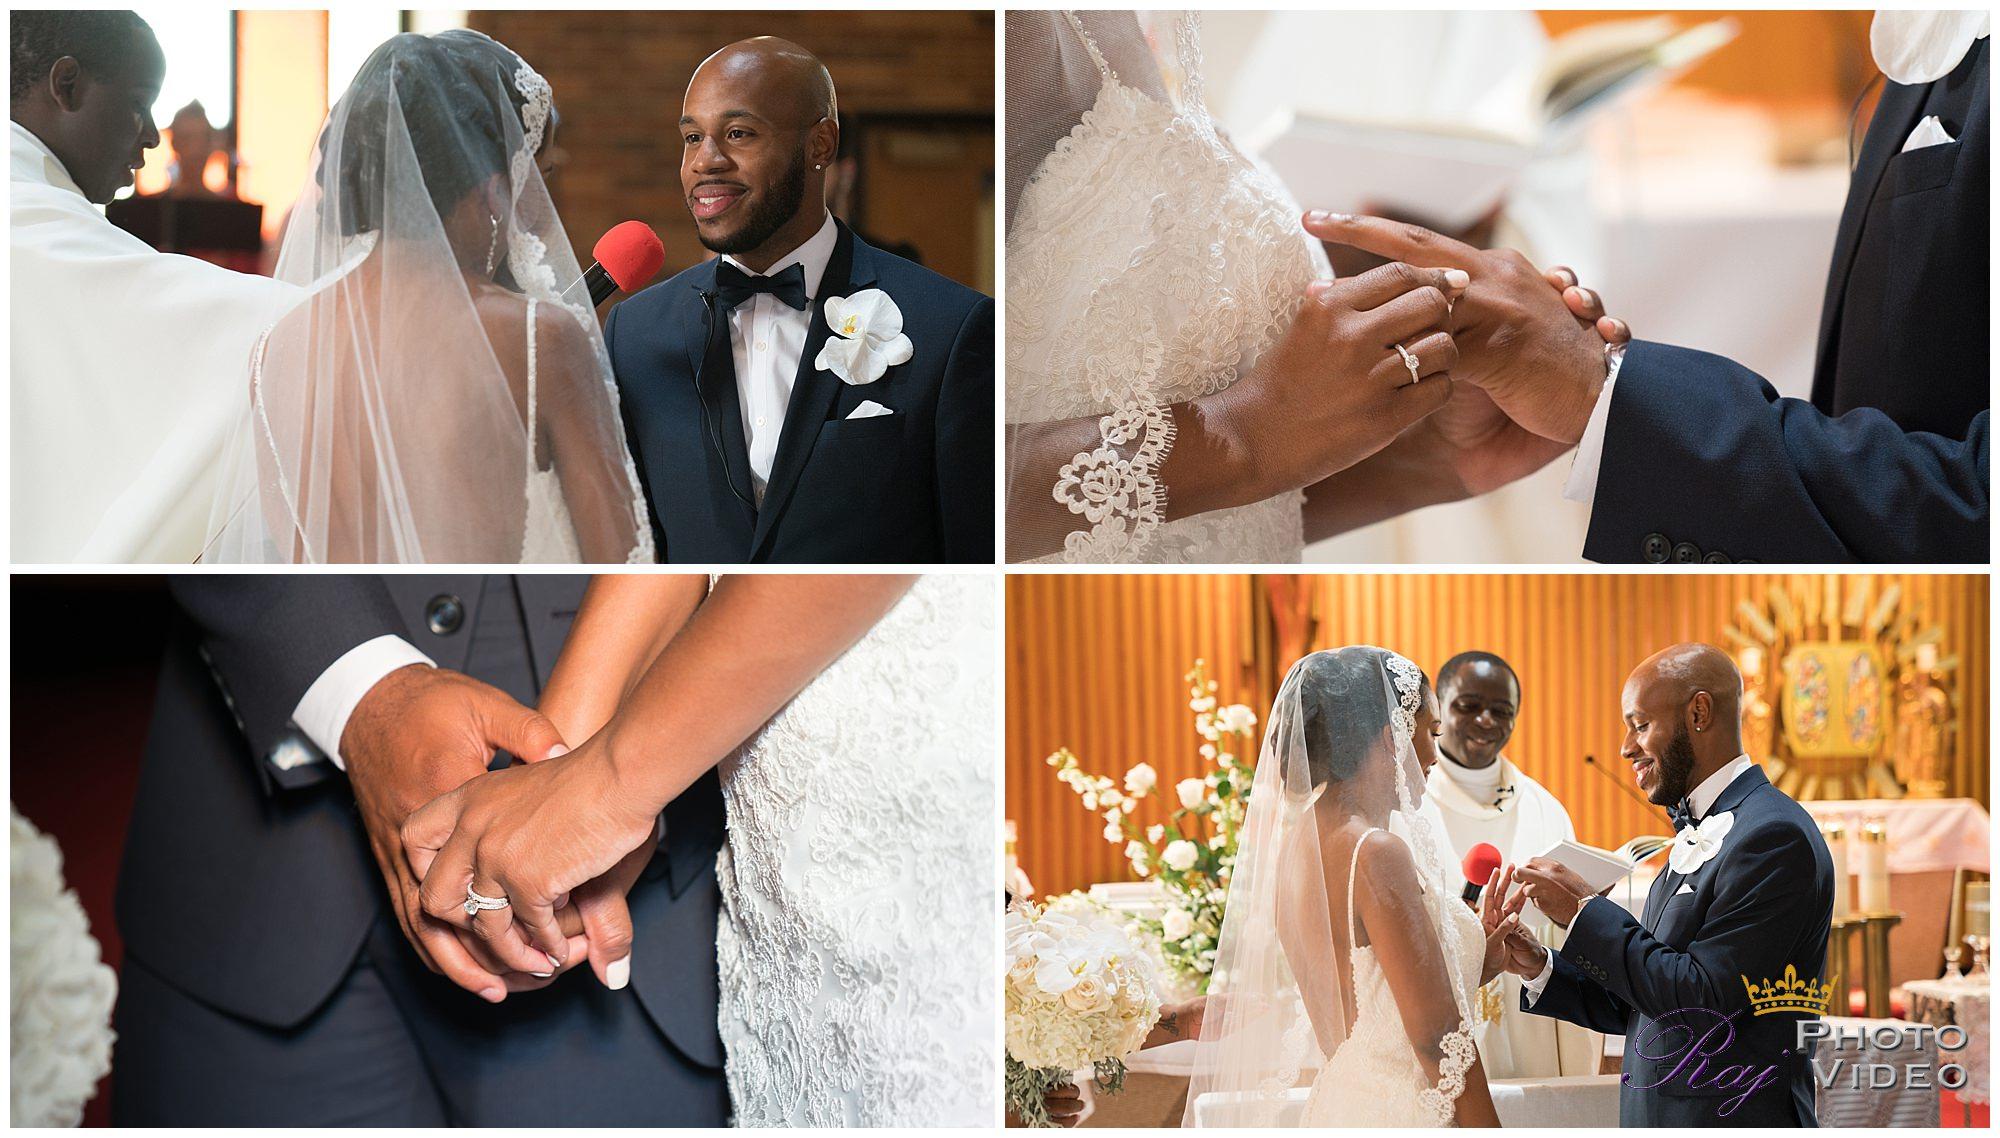 The-Armory-Perth-Amboy-NJ-Catholic-Wedding-Yudelkis-Stephen-9.jpg